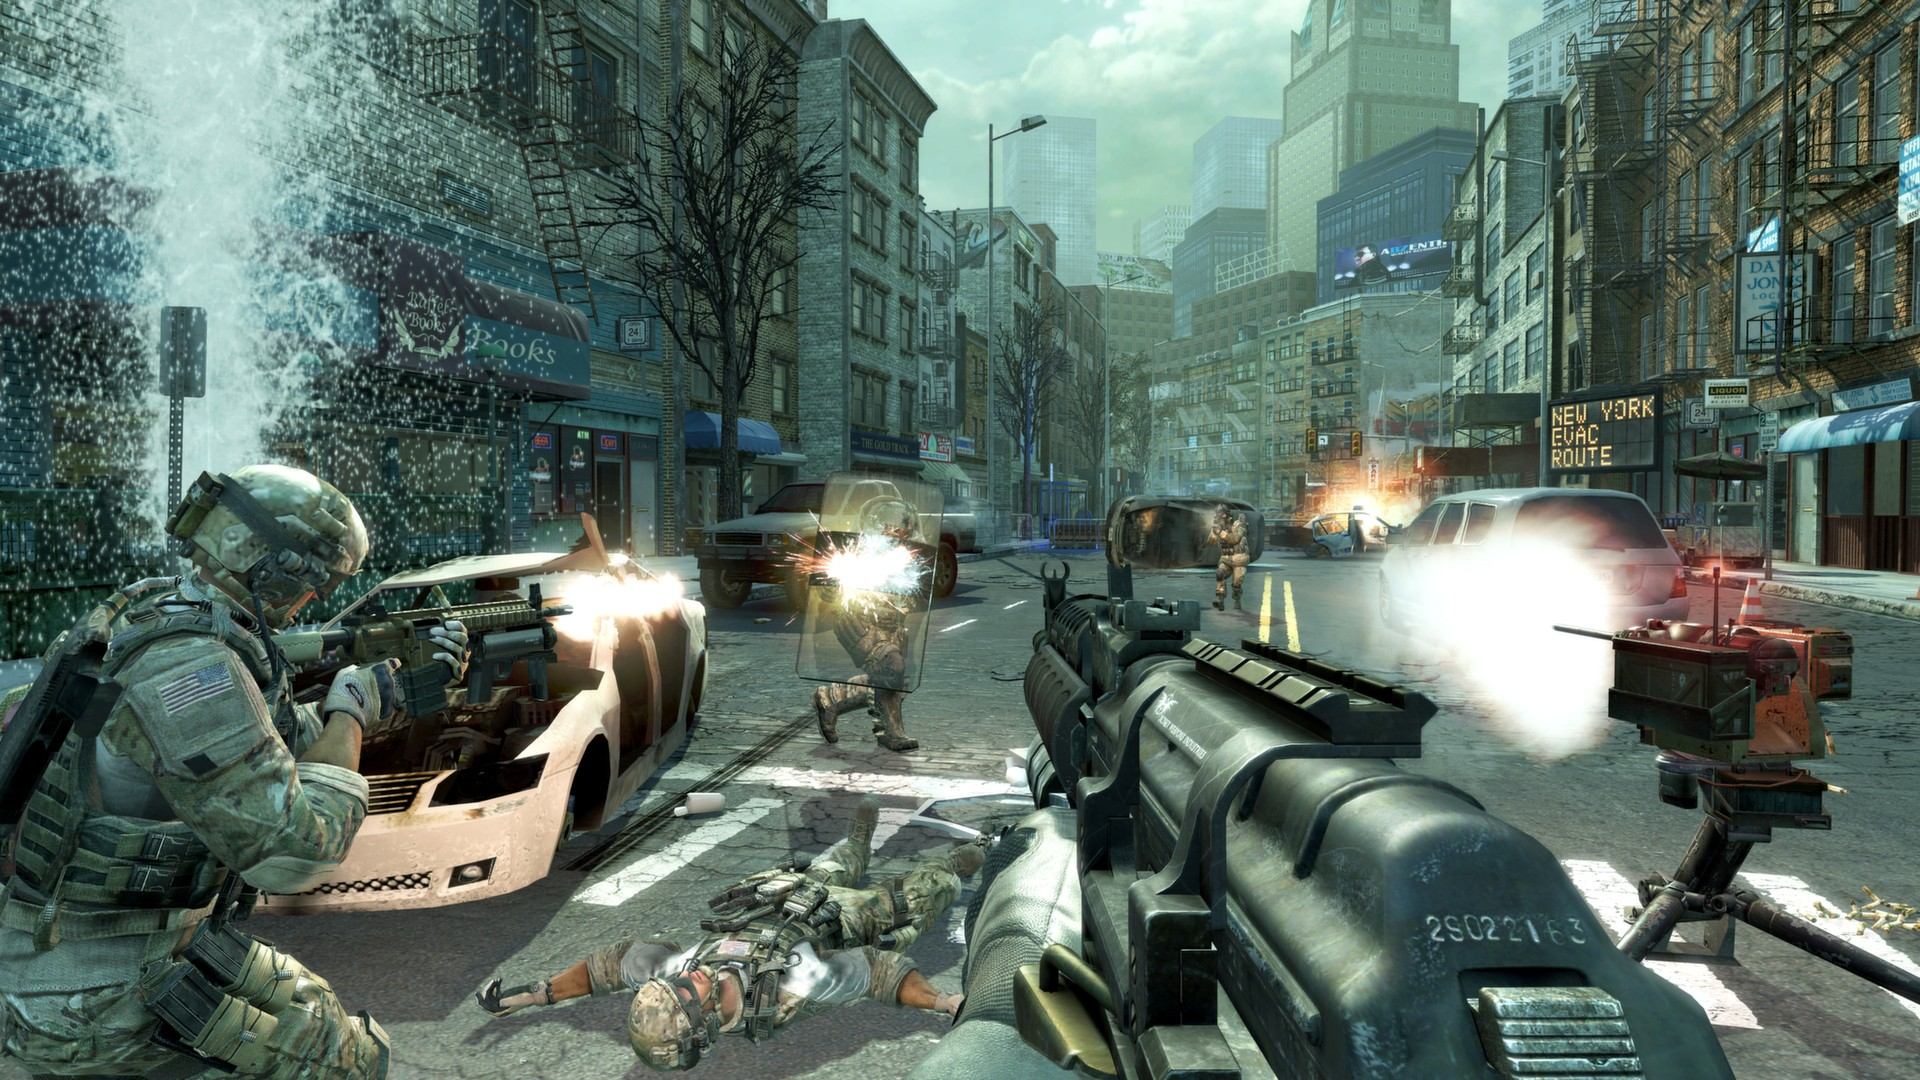 https://jeuxx-gratuit.fr/call-of-duty-modern-warfare-3-gratuit/